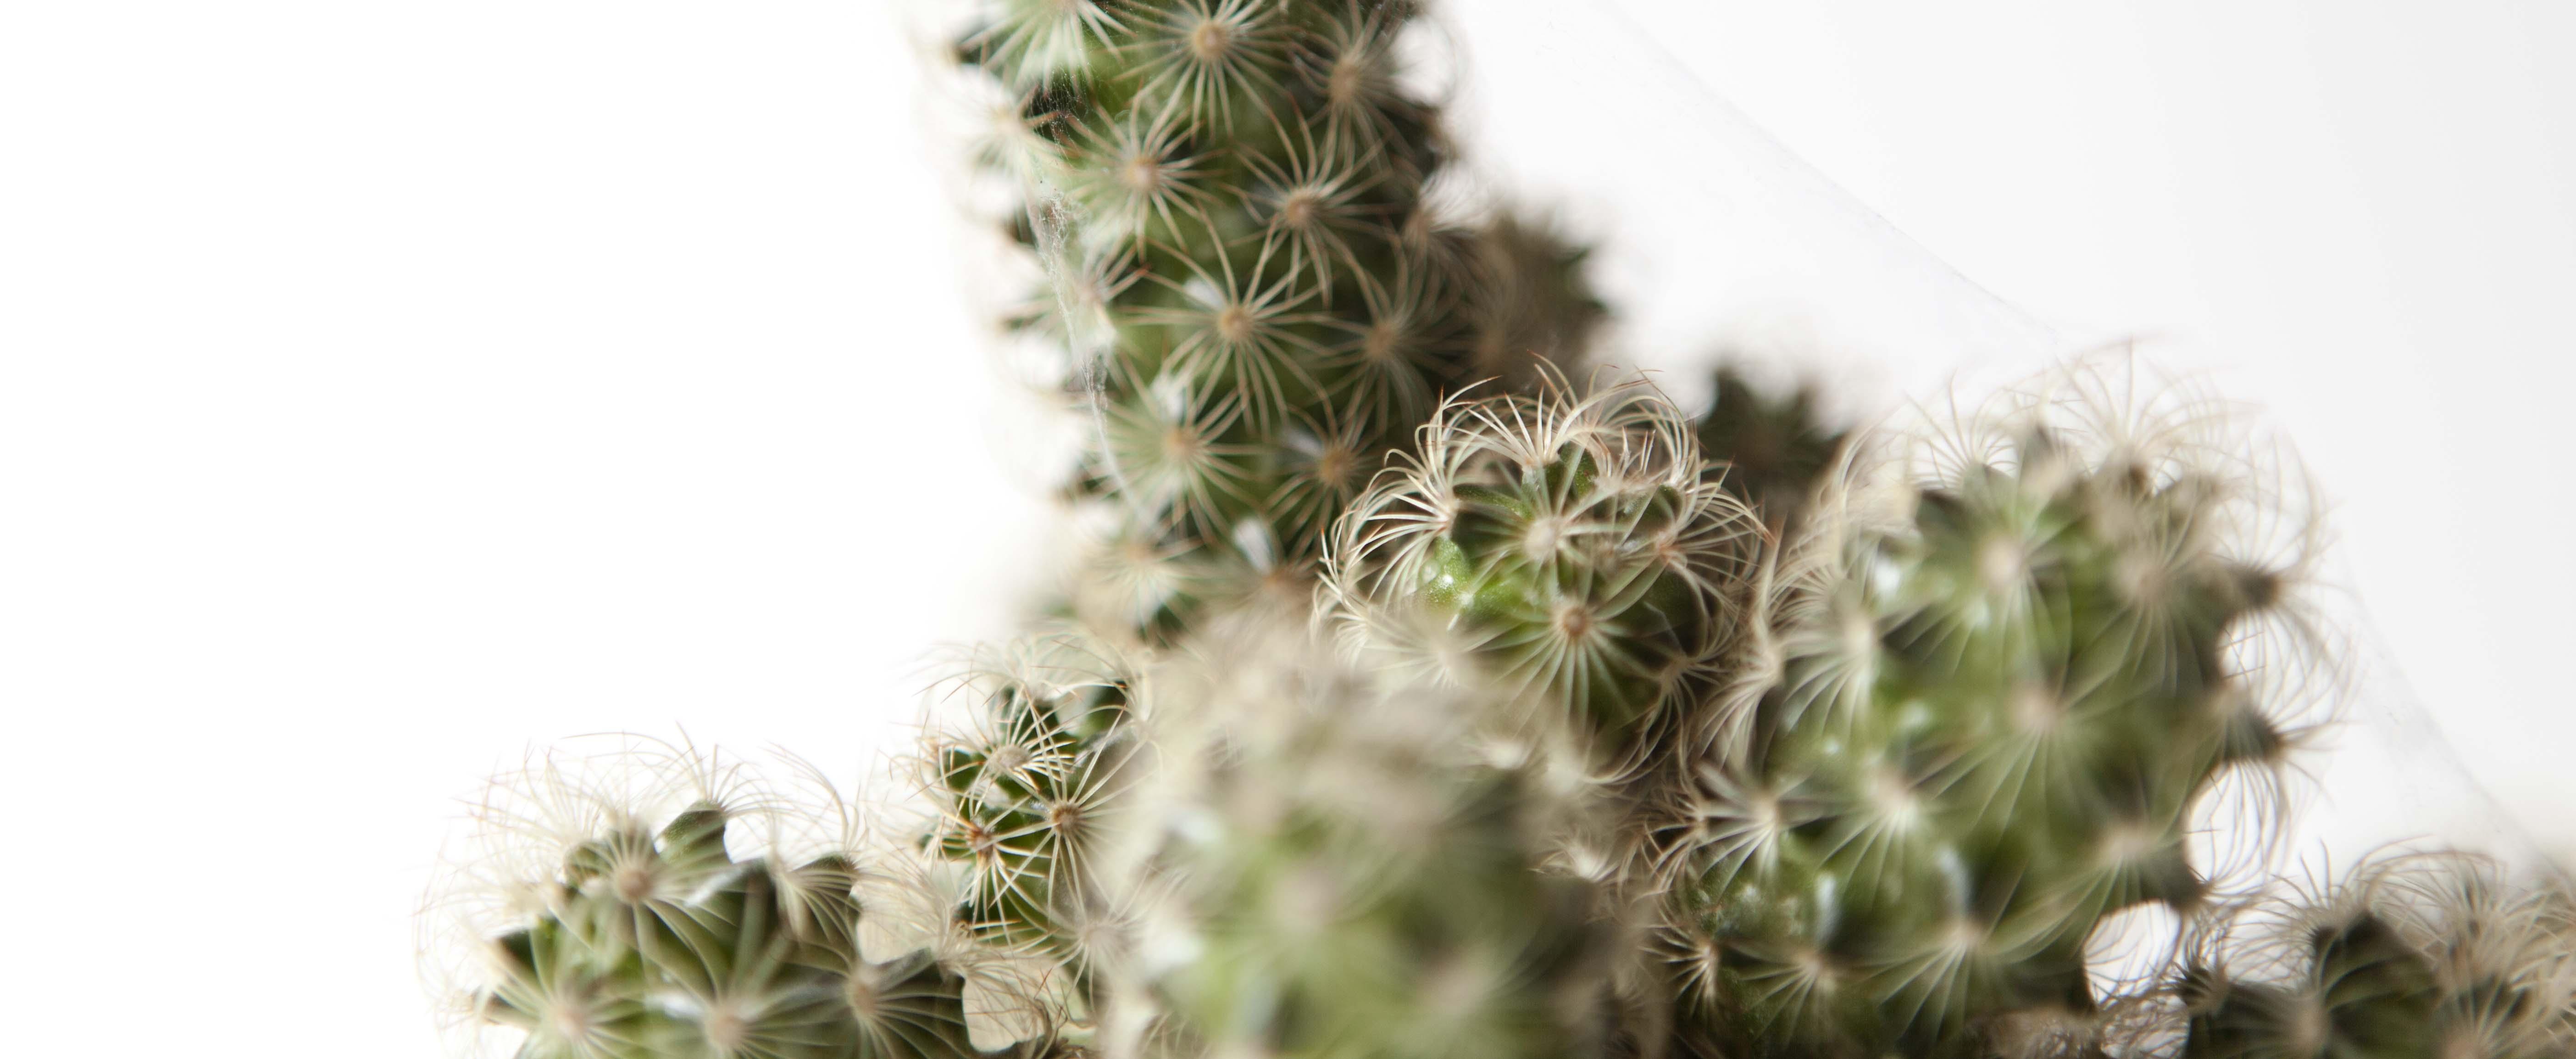 kaktus-studio-fotografering